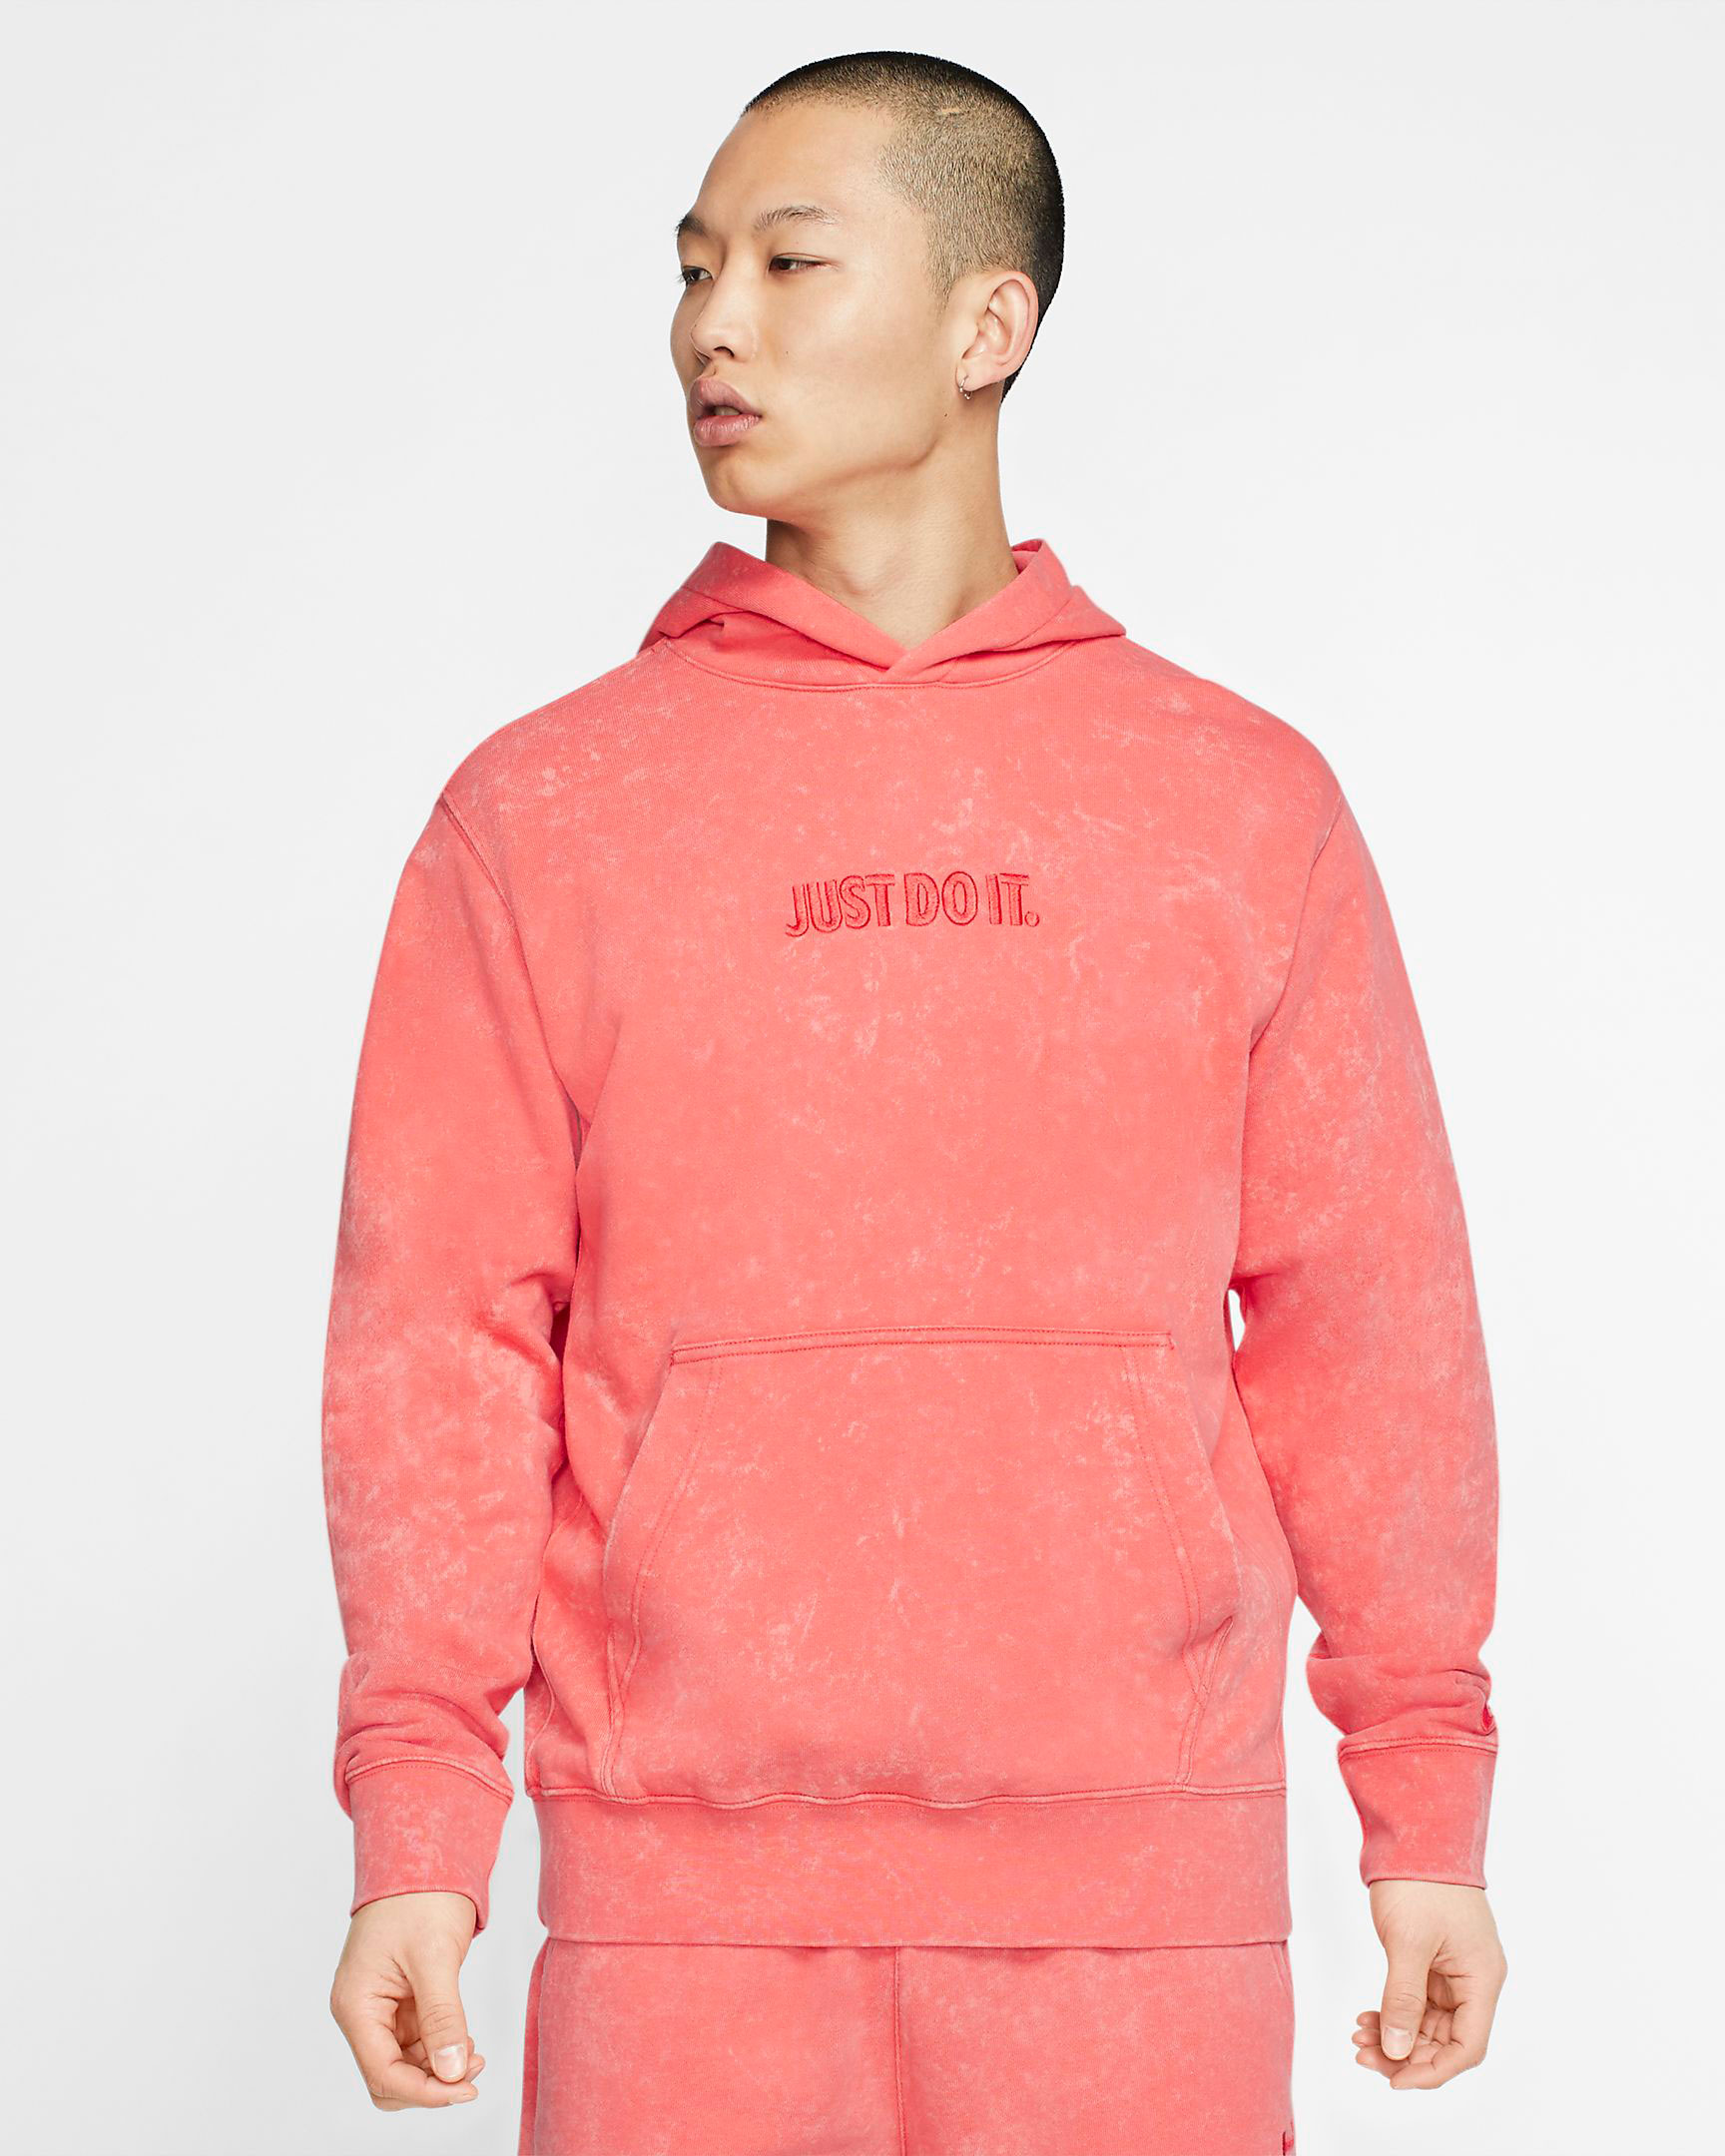 nike-jdi-just-do-it-hoodie-infrared-ember